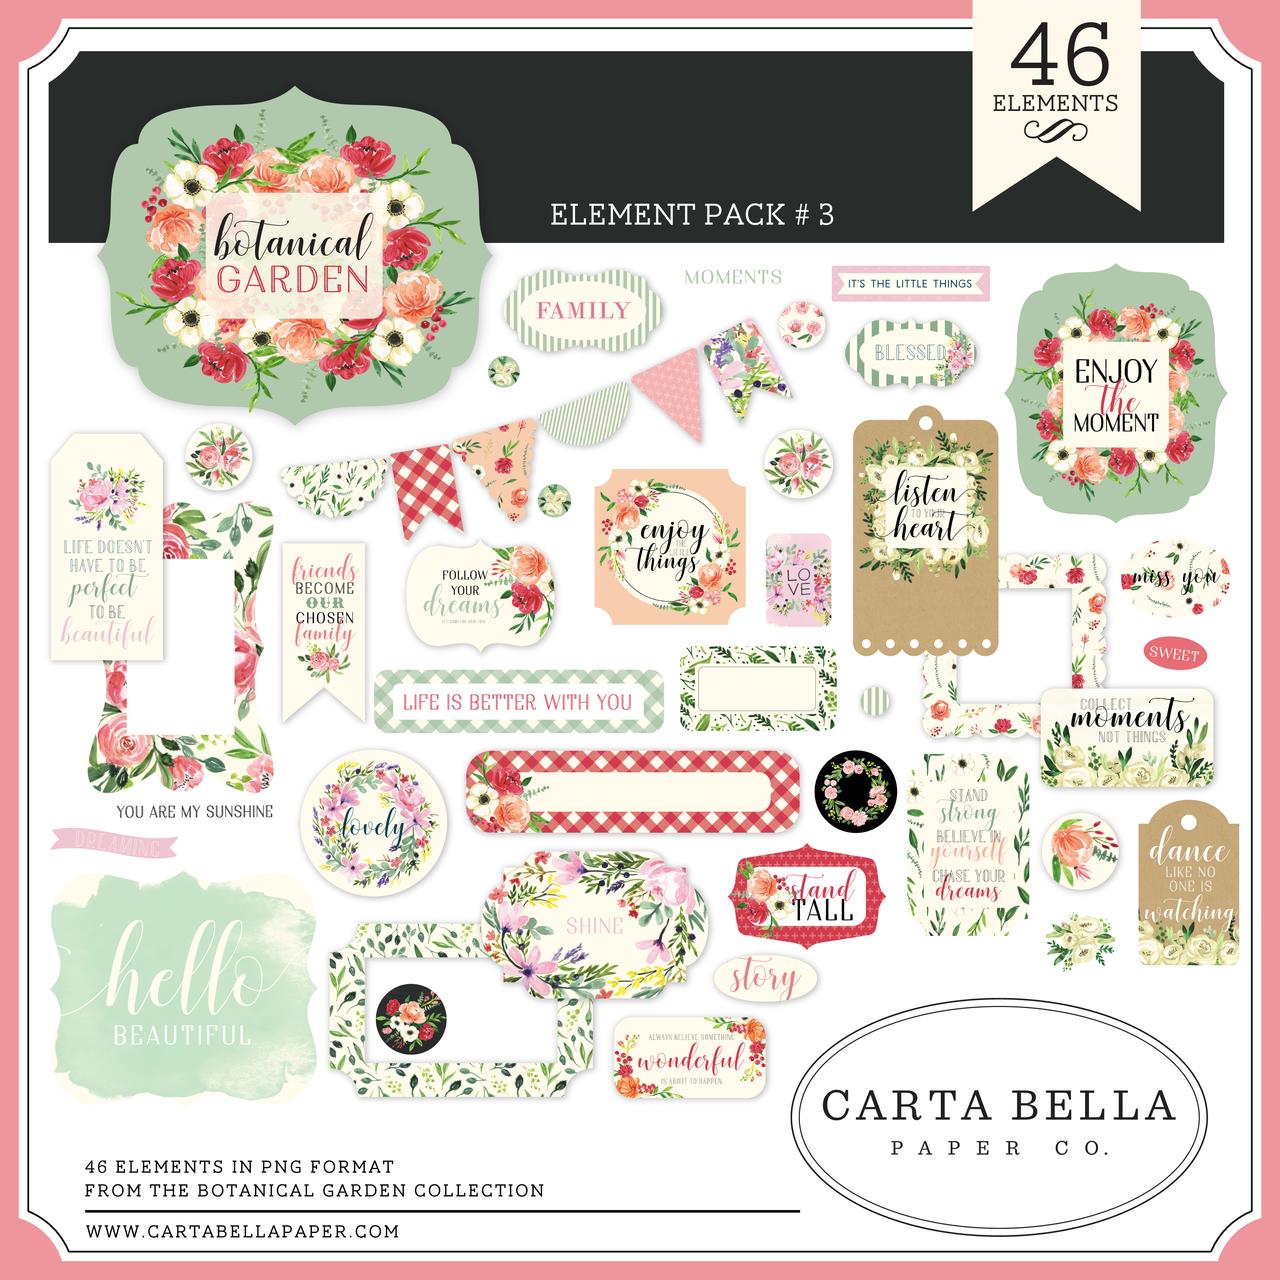 Botanical Garden Element Pack #3